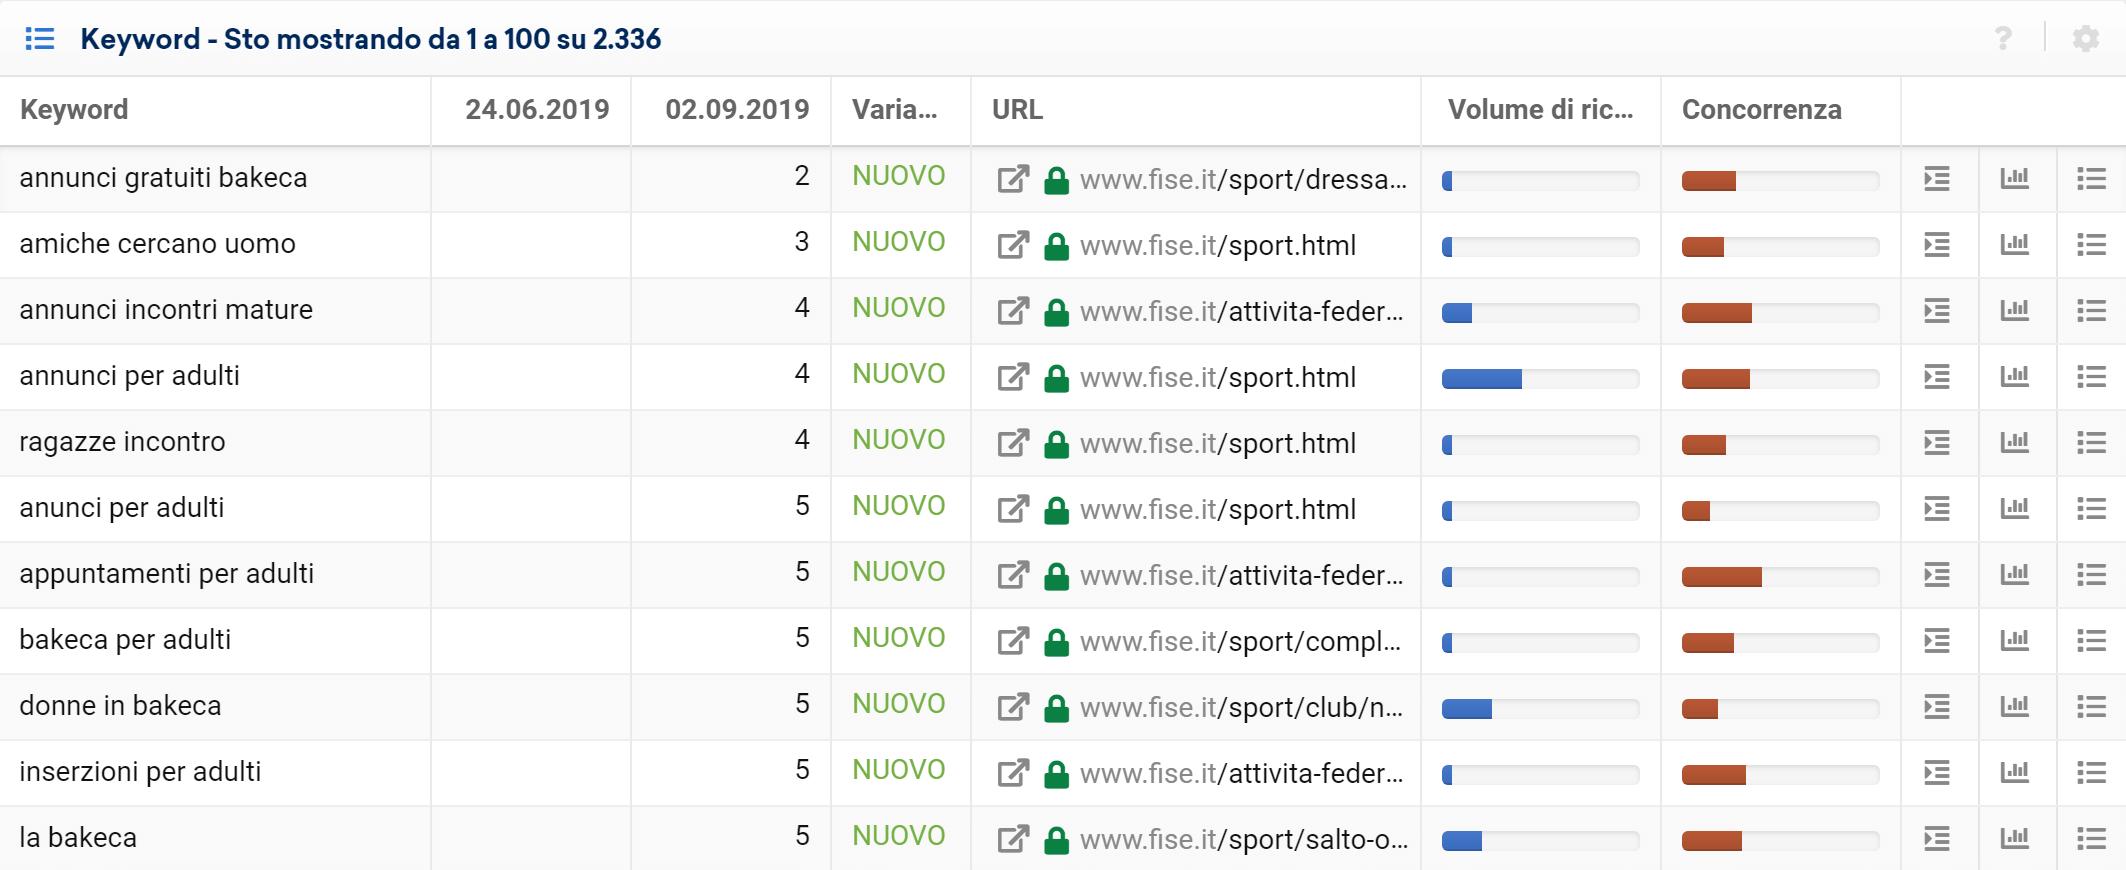 Toolbox SISTRIX: nuove keyword di ranking per fise.it